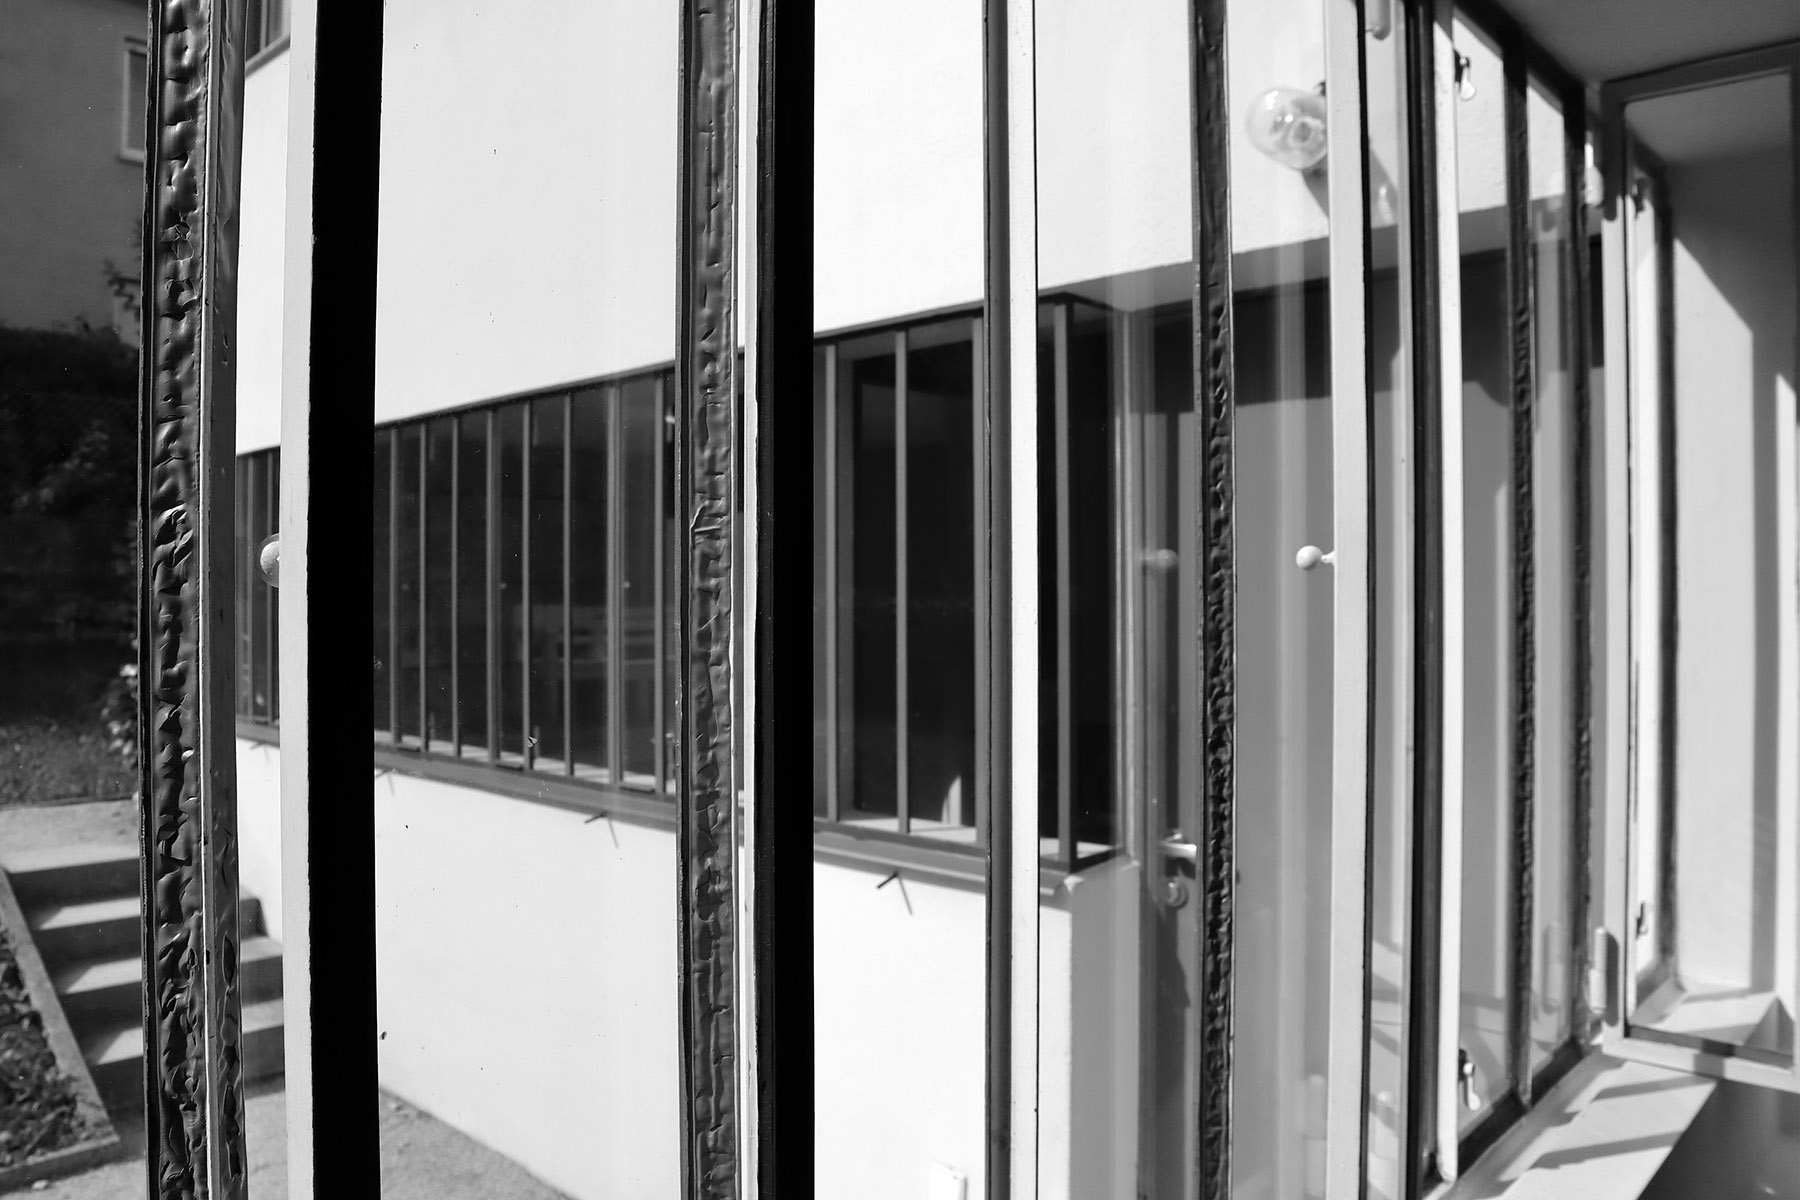 Weissenhofmuseum im Haus Le Corbusier. Der Blick aus dem Raum des Dienstmädchens.